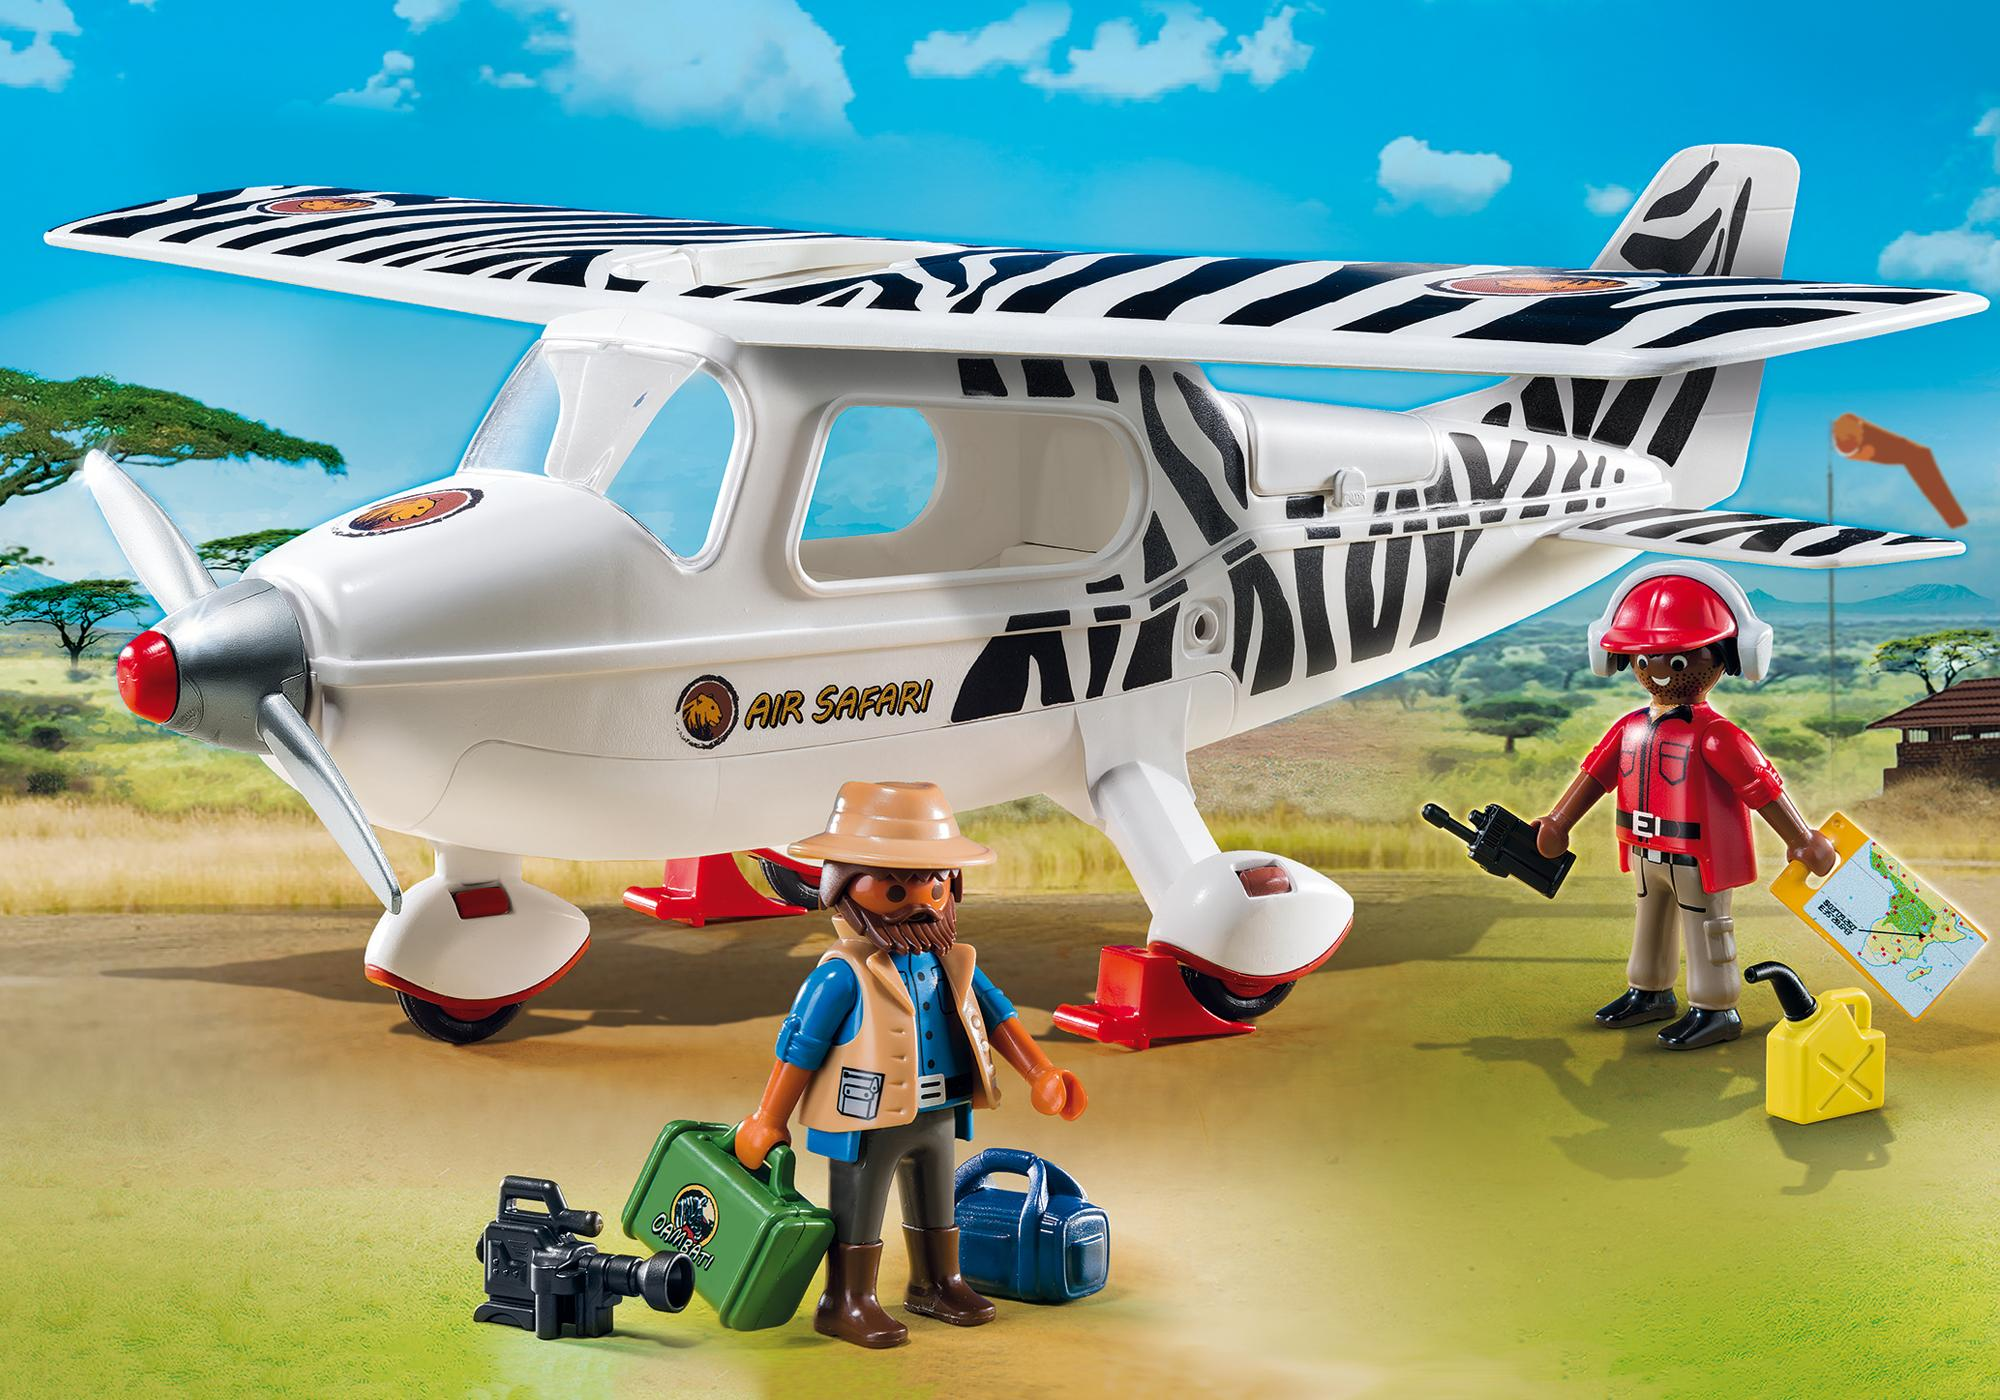 6938_product_detail/Avioneta de safari